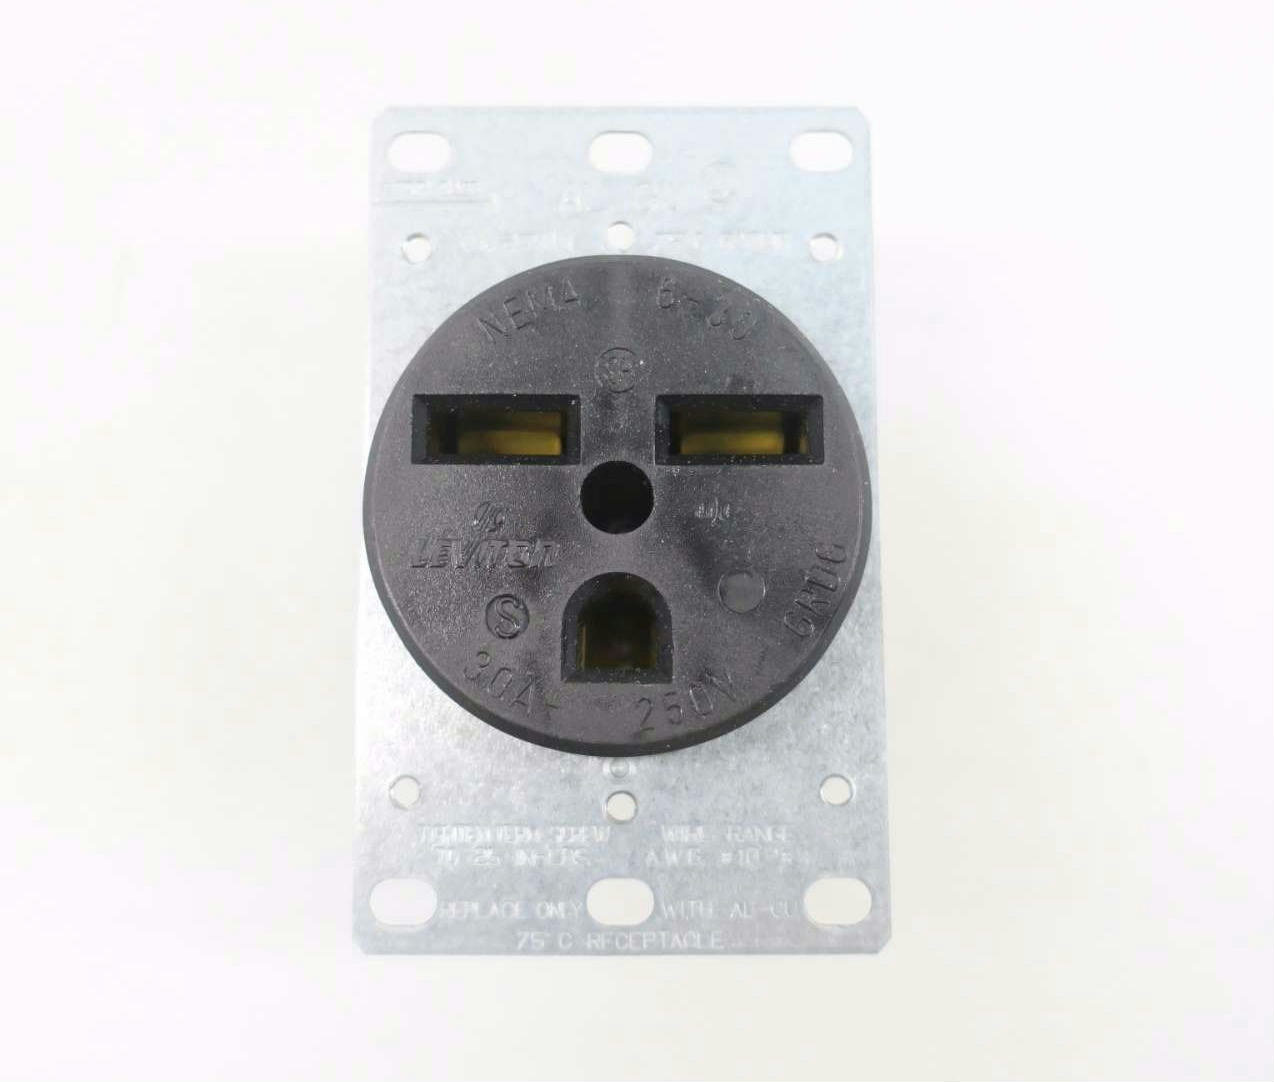 leviton 5372 nema 6 30r 30a 250v 2p 3w black receptacle instock901 rh instock901 com Leviton Wall Plates Leviton CS8264C